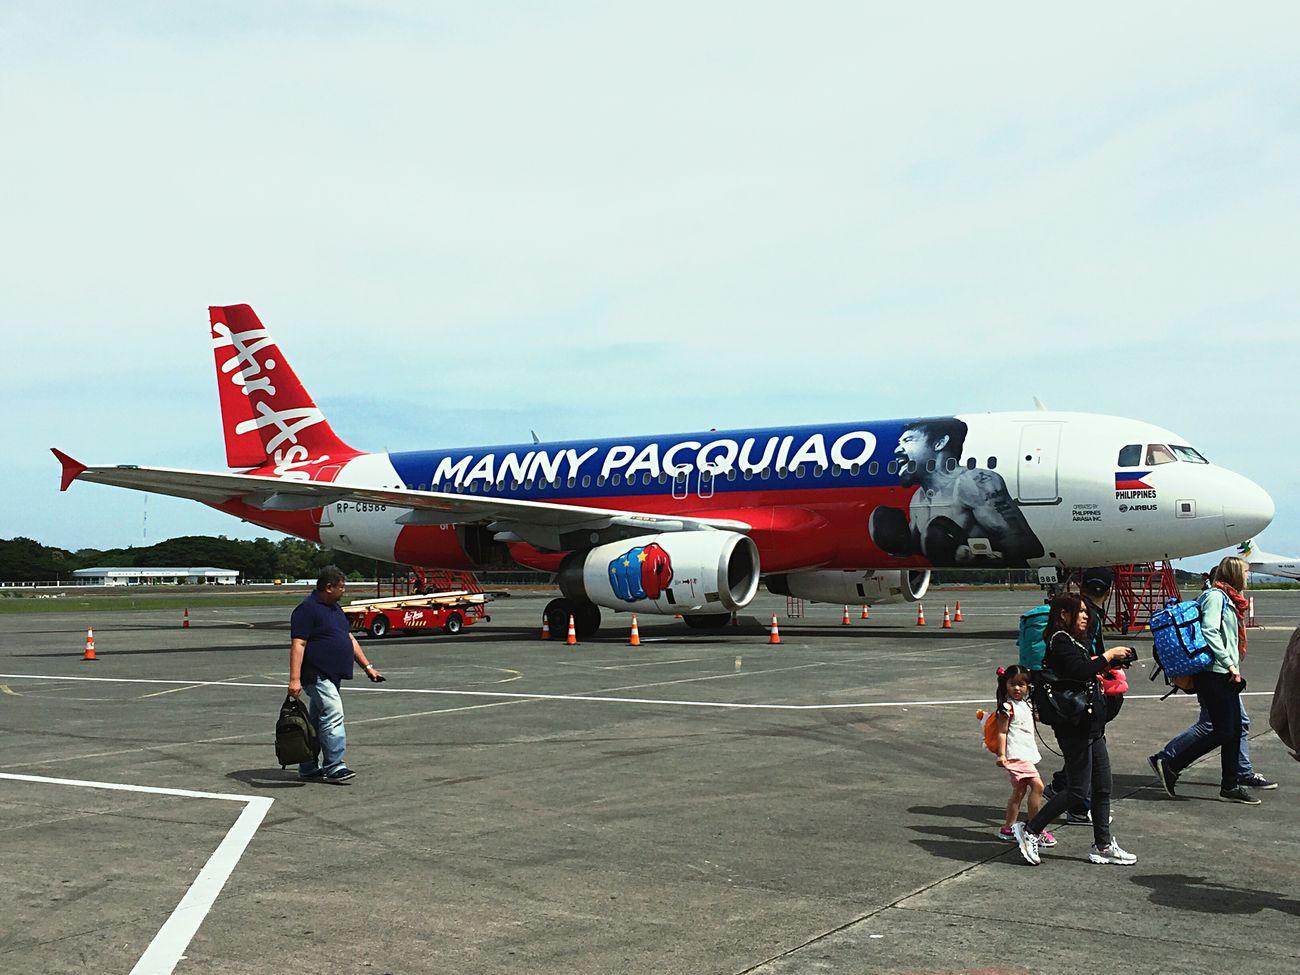 isola dì Palawan aeroporto di Palawan Air Asia e ad attenderci : Mannypacquiao 😎😎😎